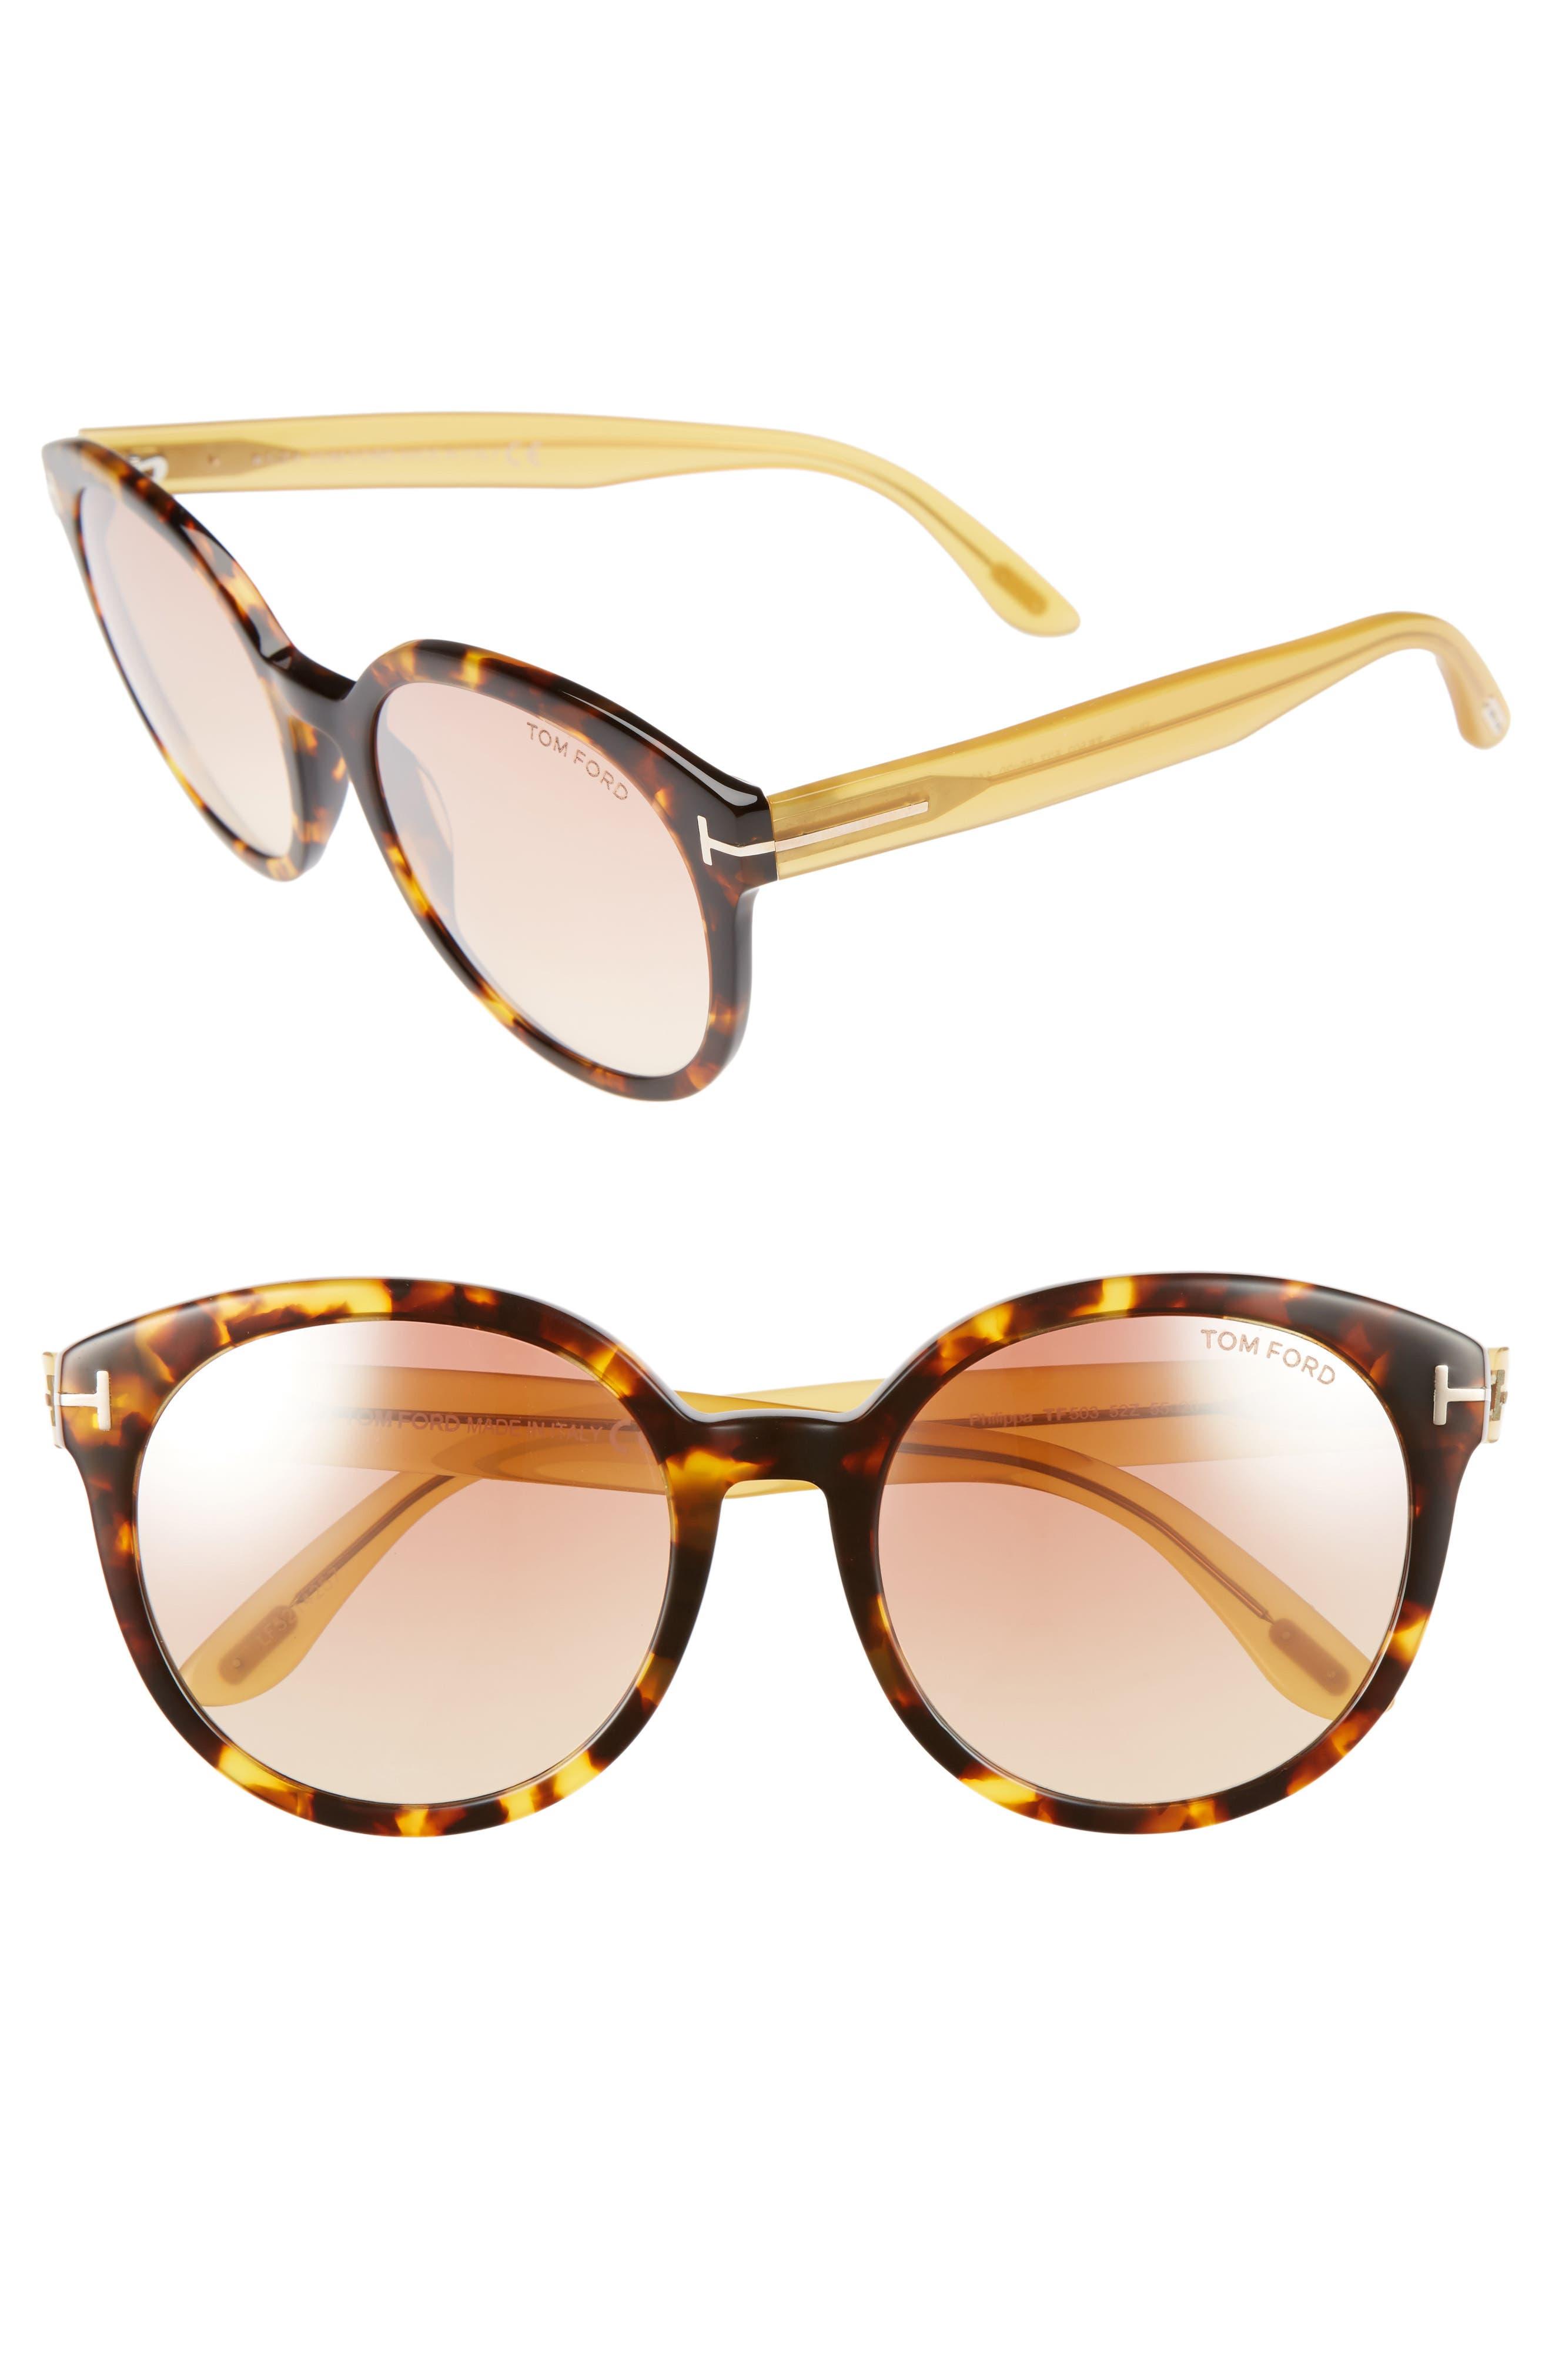 Alternate Image 1 Selected - Tom Ford Philippa 55mm Gradient Round Aviator Sunglasses